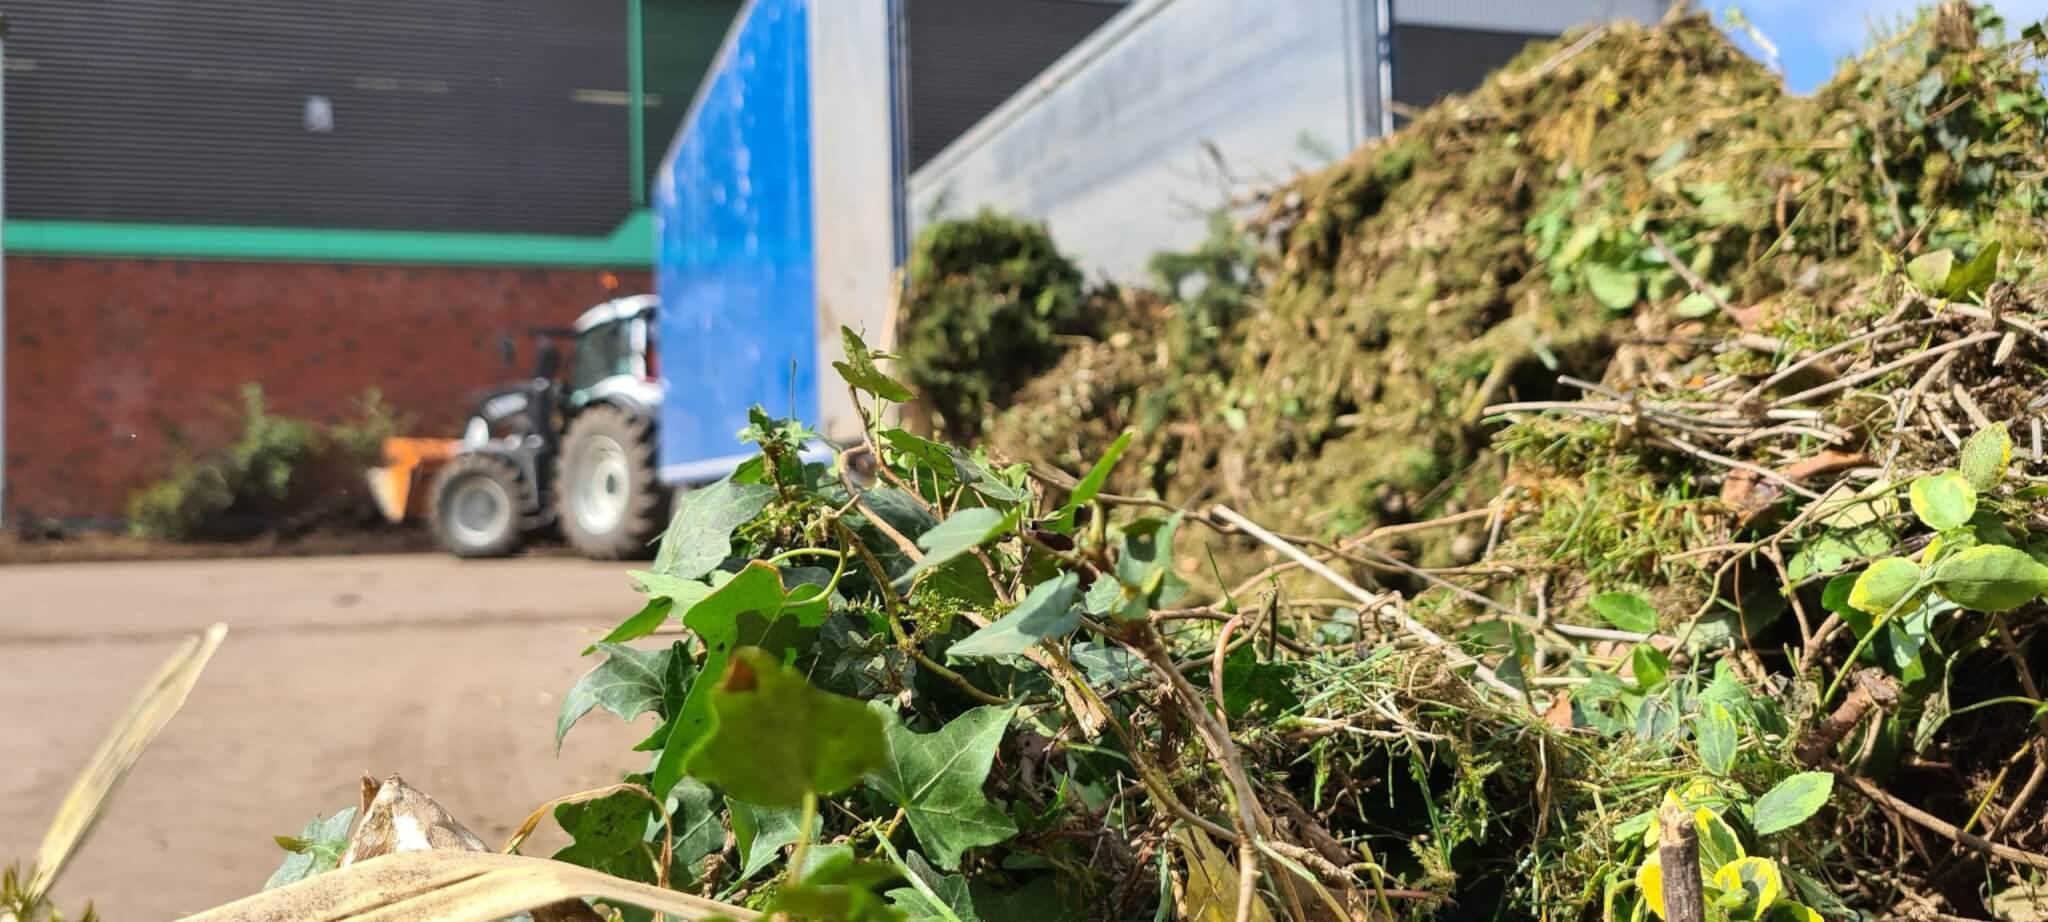 Tranporte bei der Pabst Umweltservice GmbH